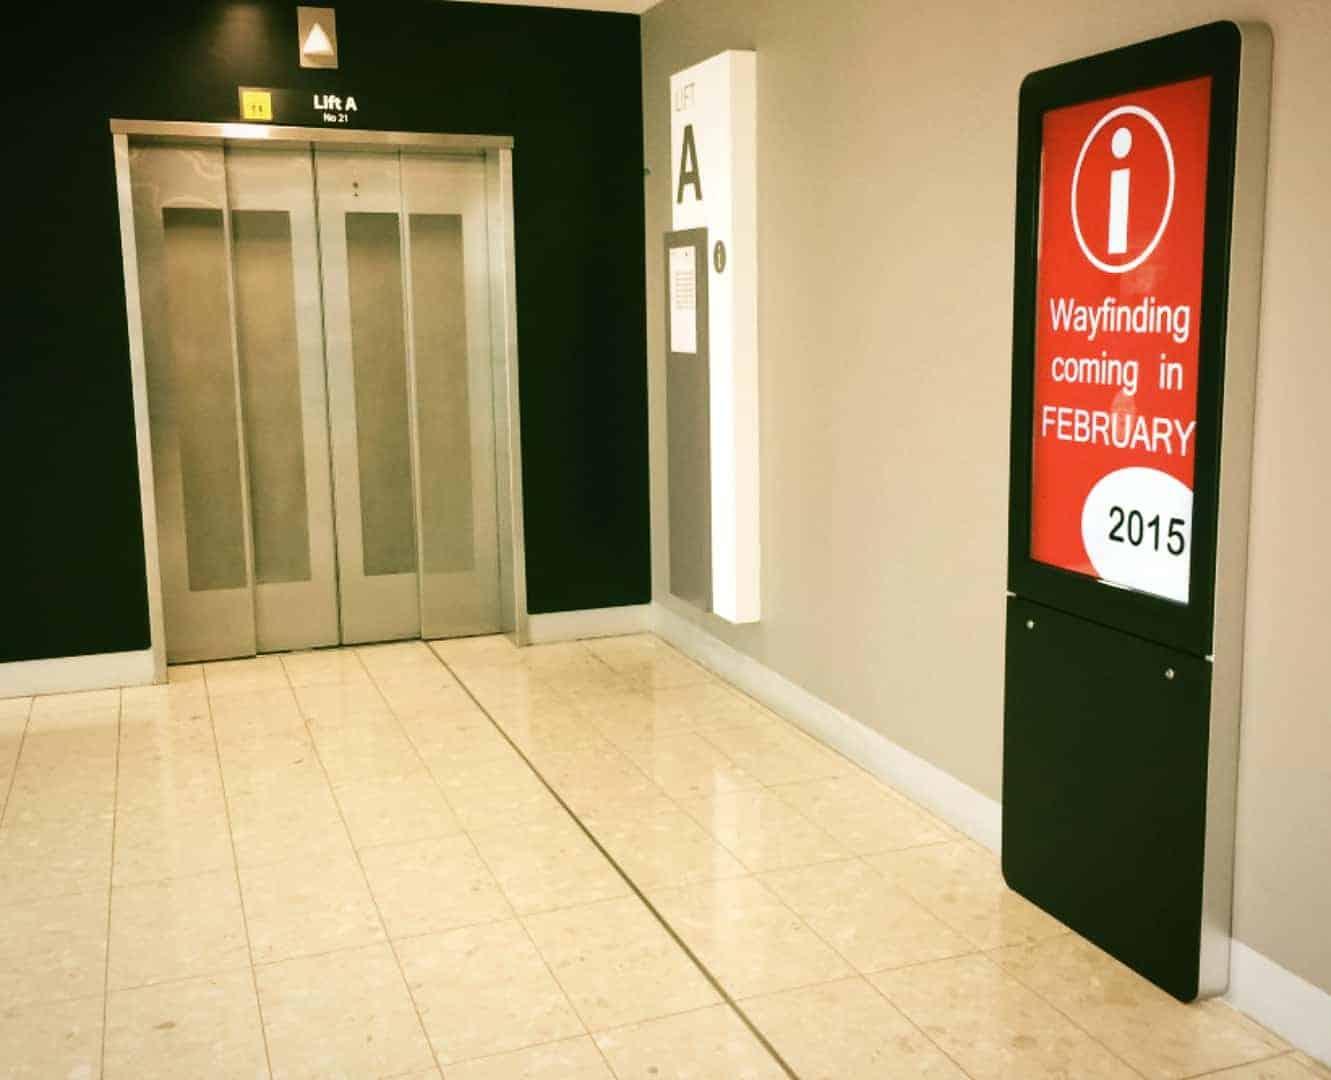 002 Digital Wayfinding Solutions - Liverpool Hospital Entrance